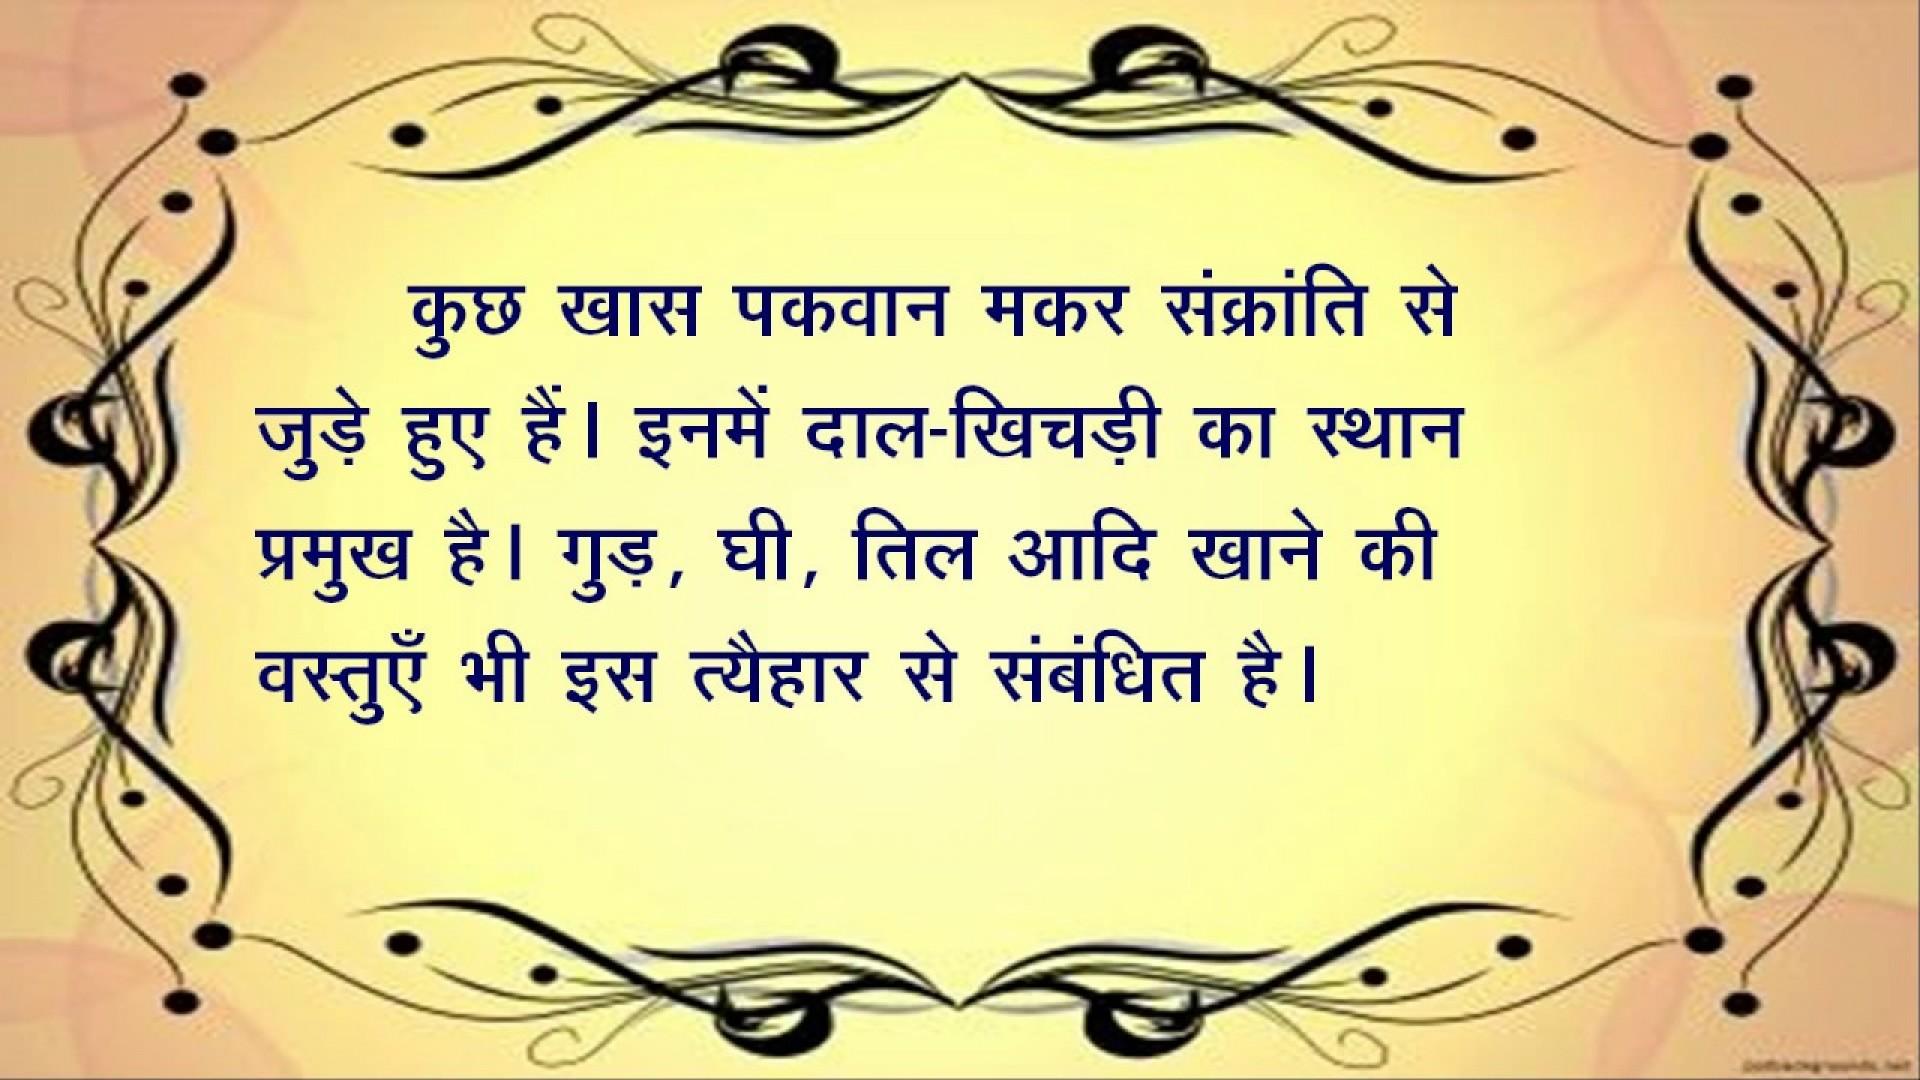 002 Maxresdefault Makar Sankranti In Hindi Essay Surprising Pdf Download 2018 1920